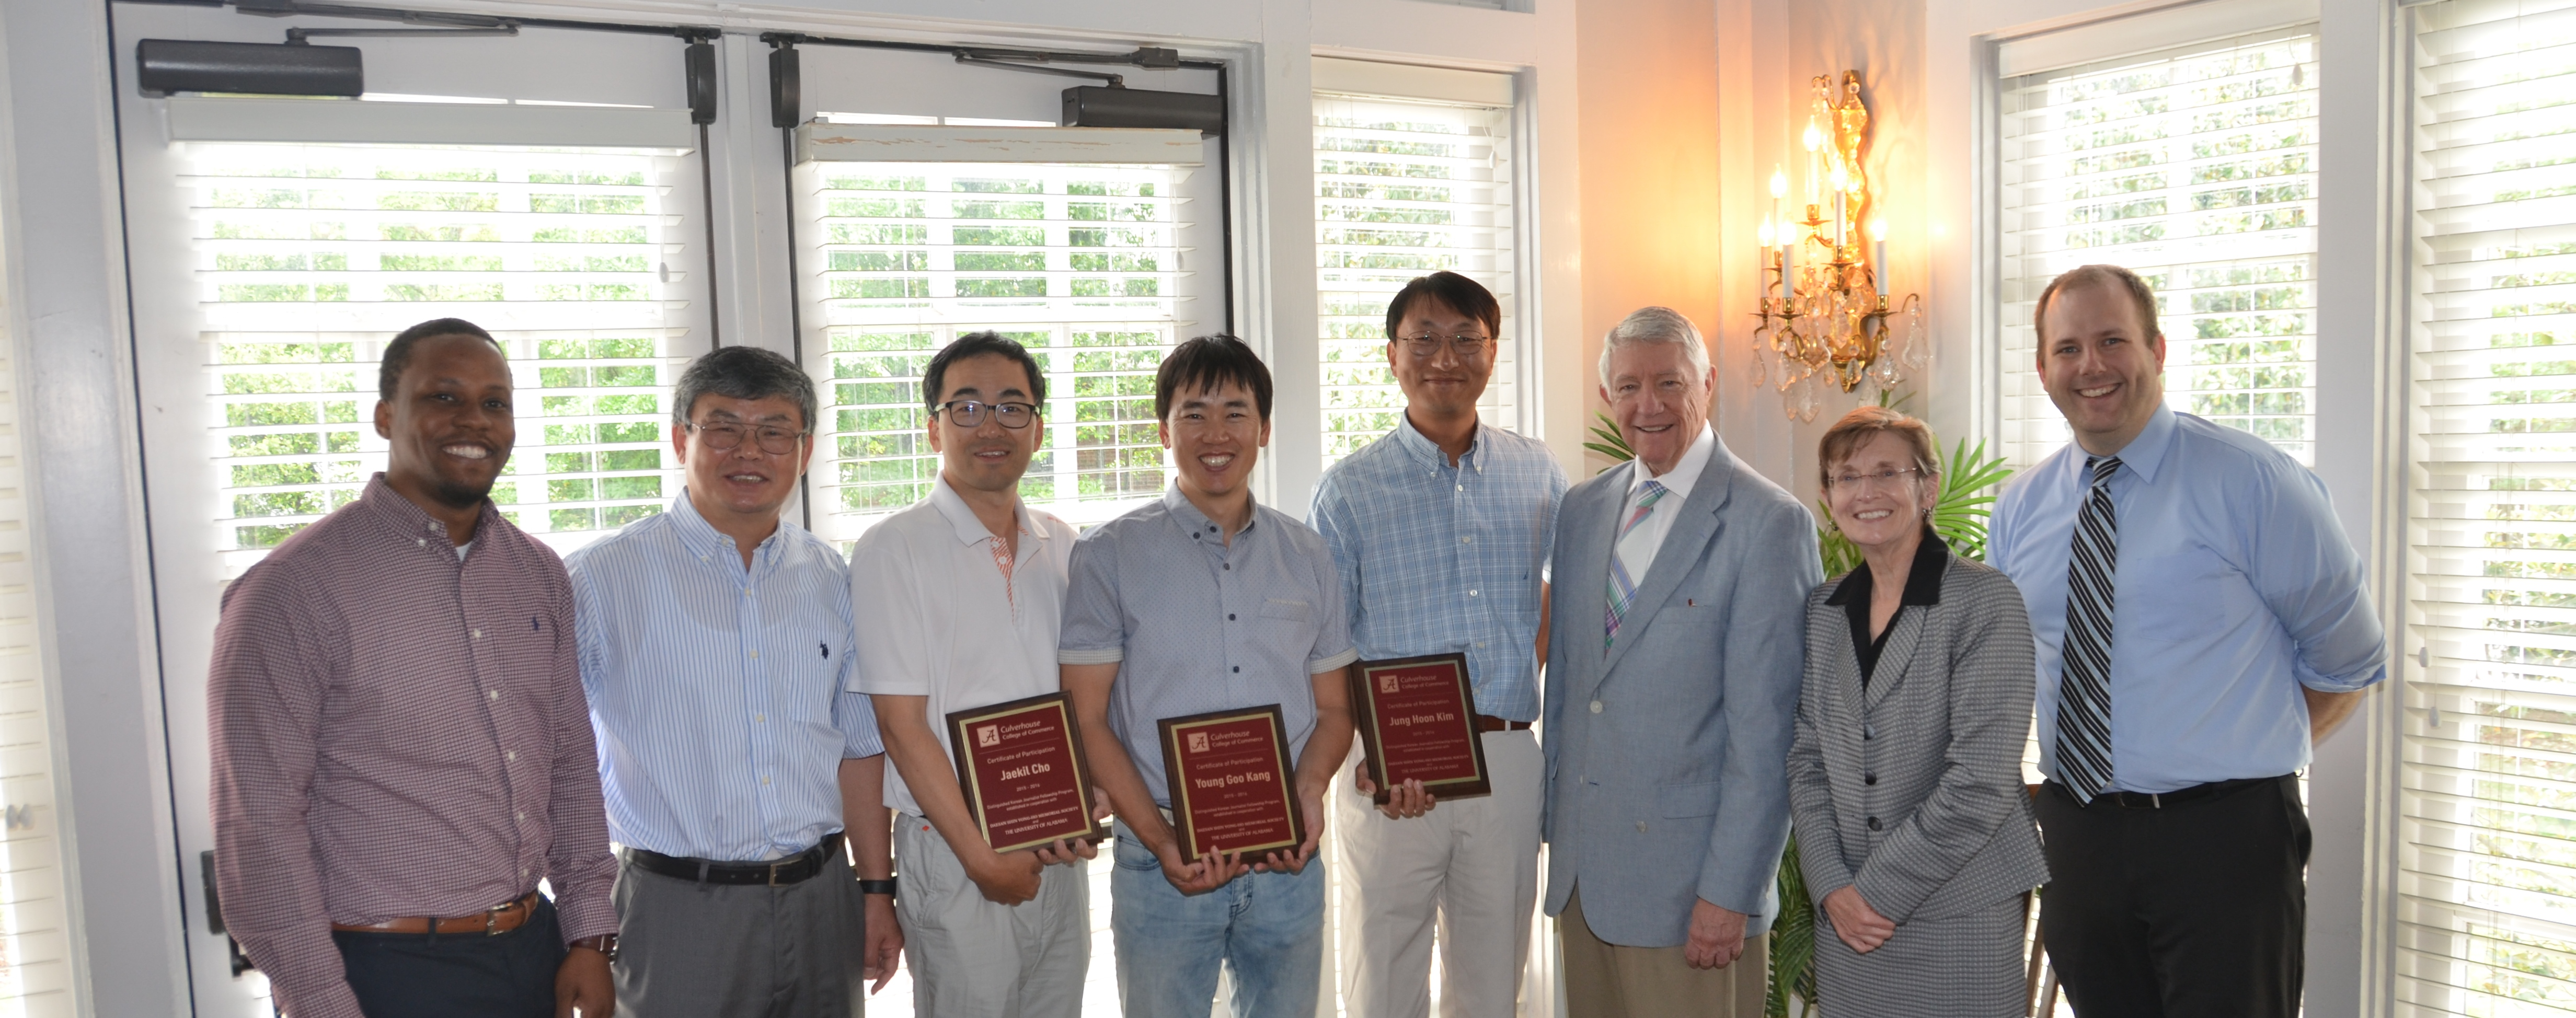 Korean scholars